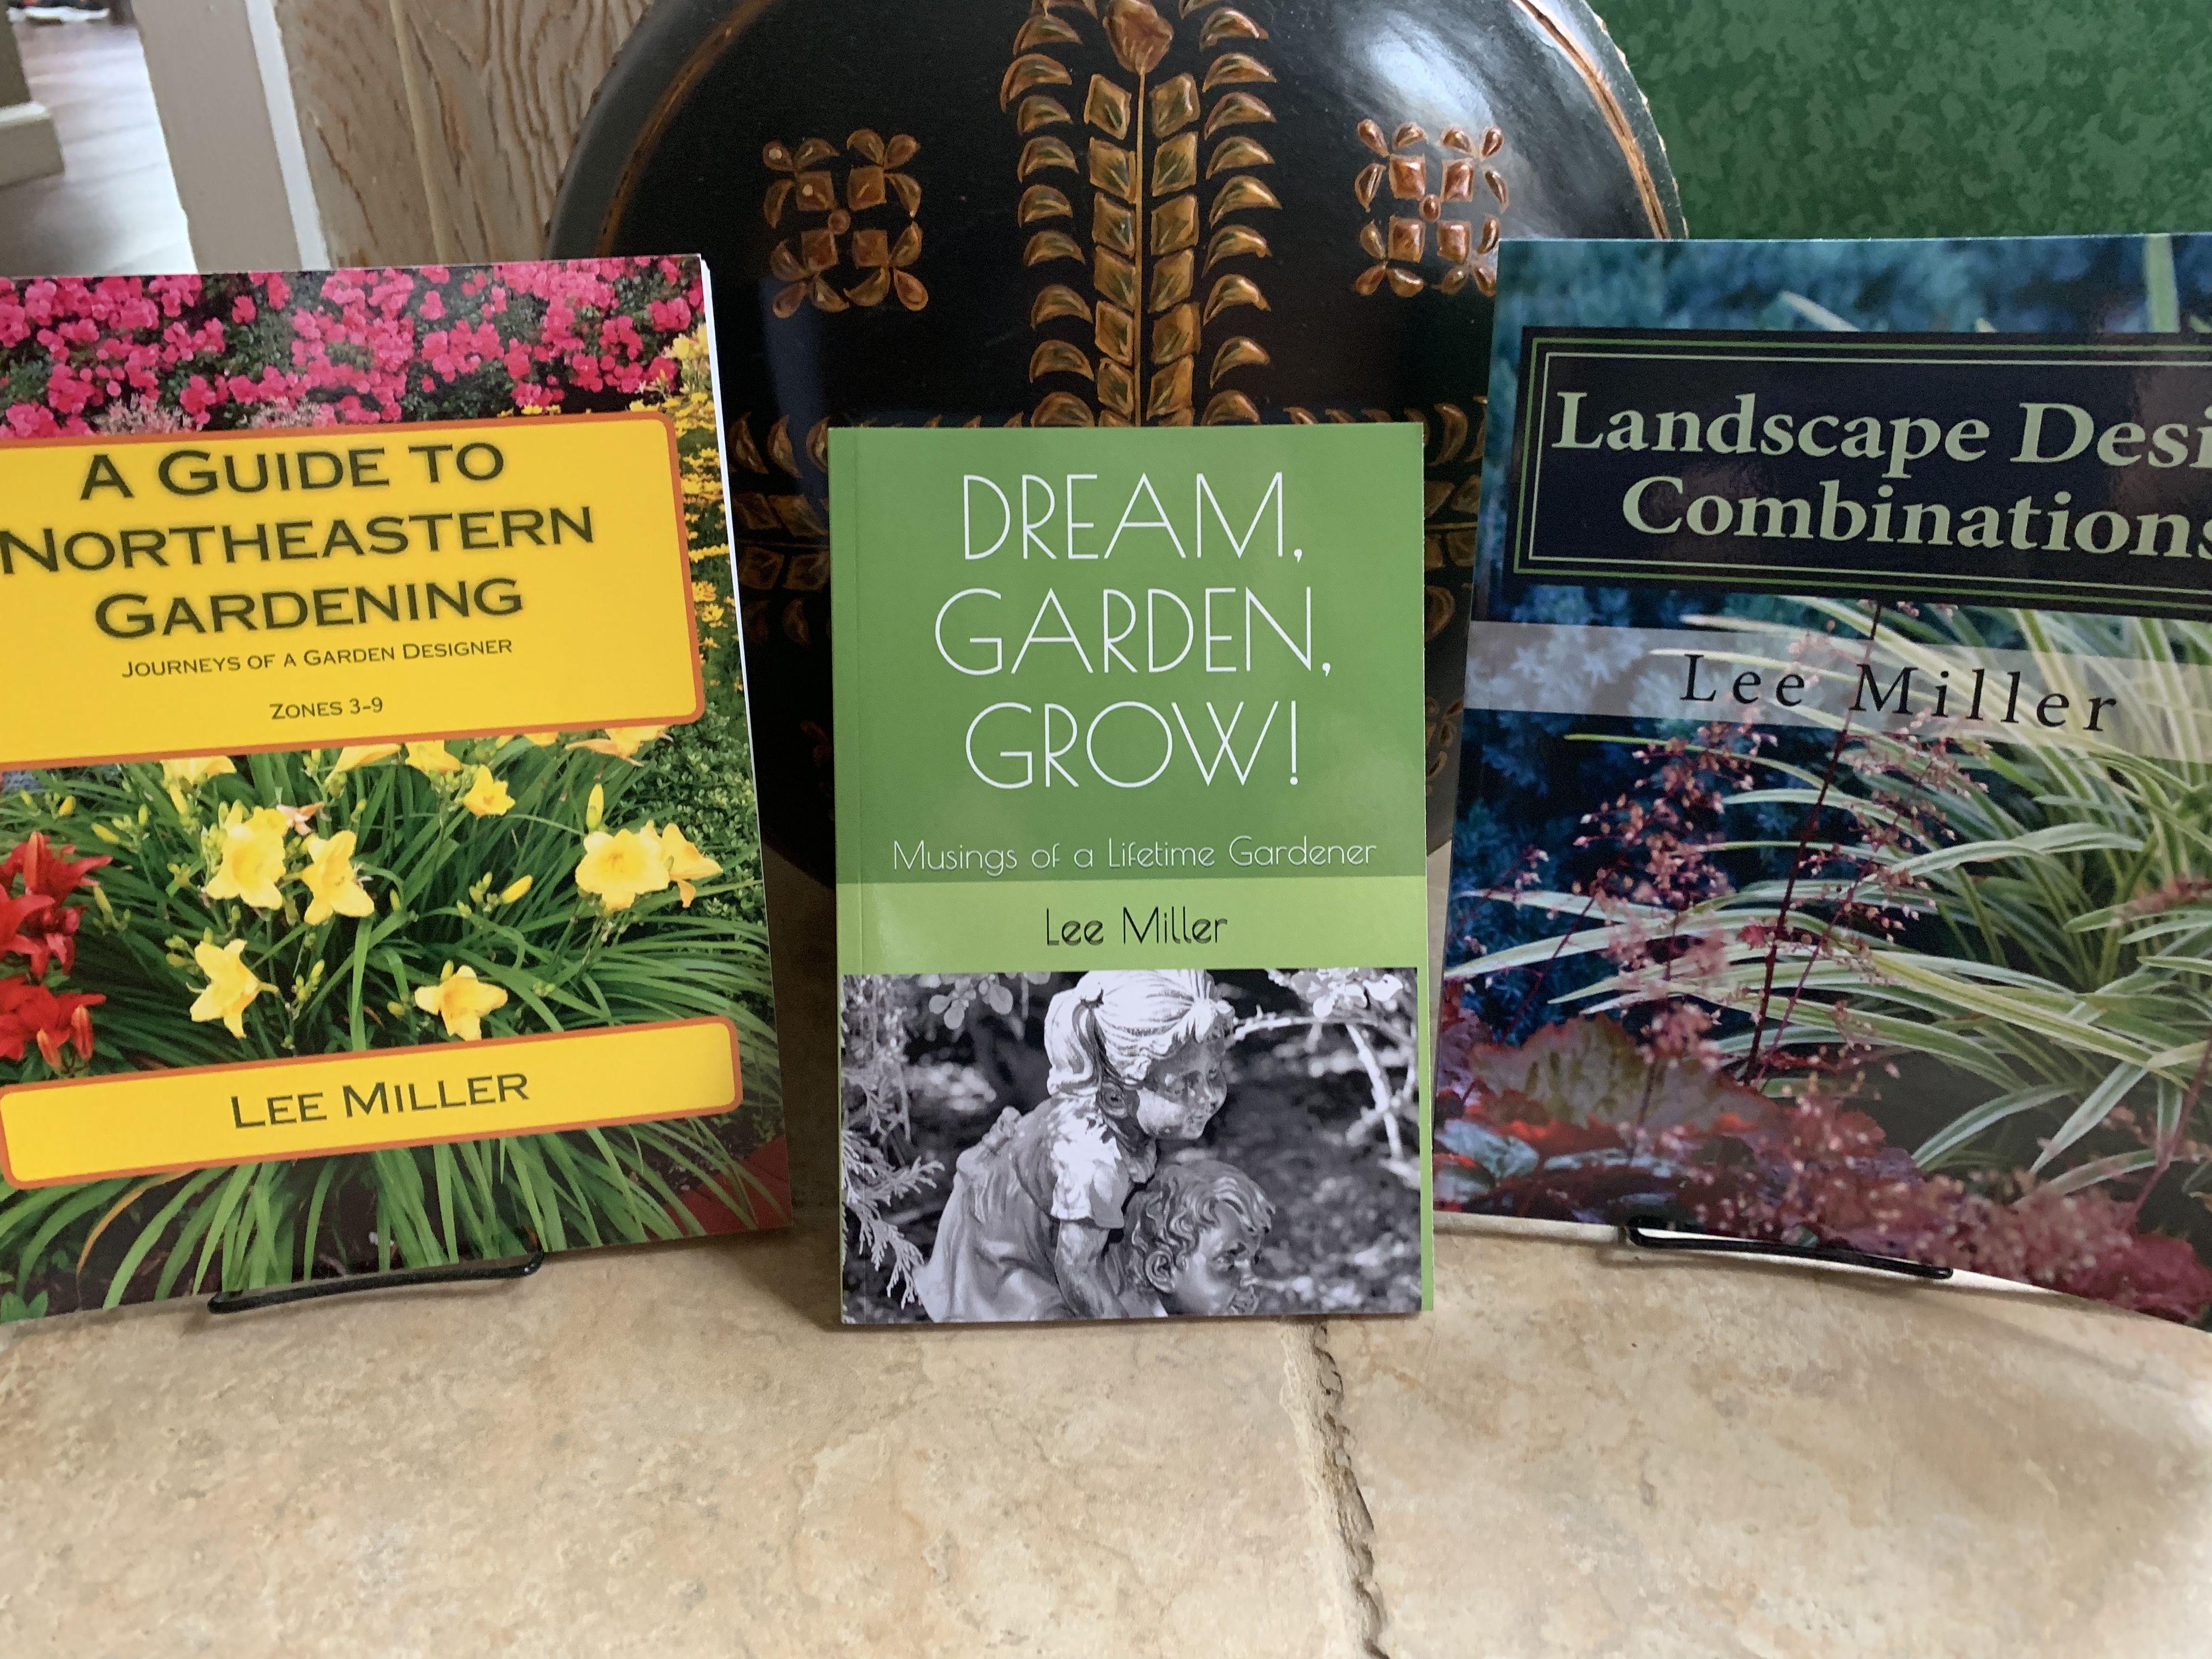 9d9e5222628b2885ea08b1a5b3c9c78e - What Zone Is Long Island For Gardening